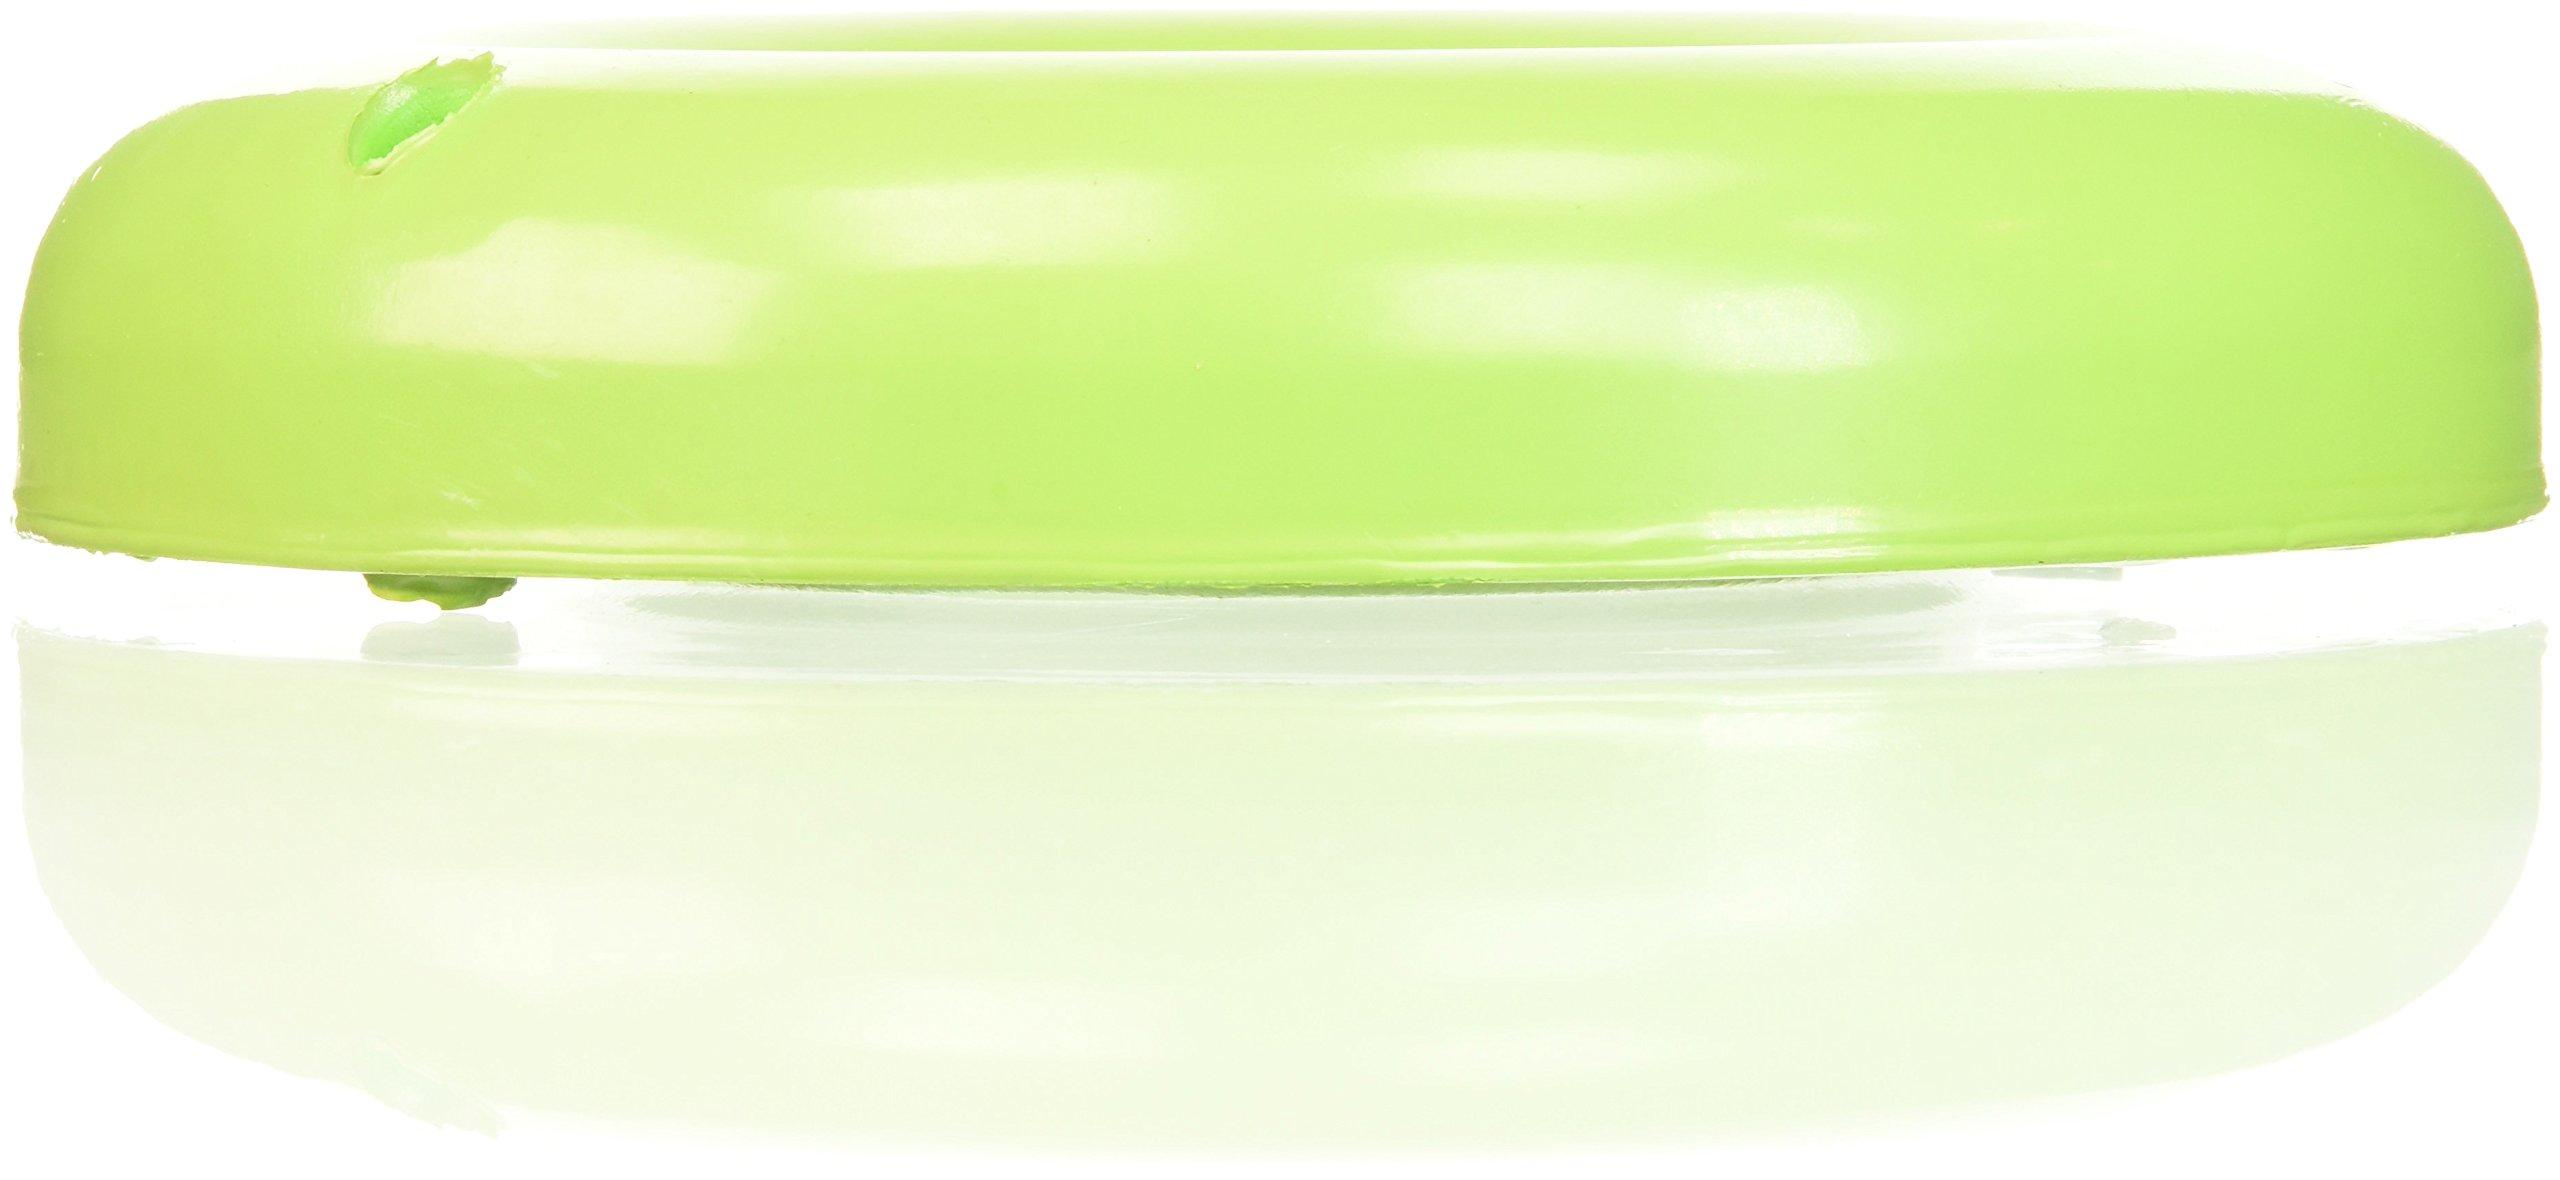 Sani Seal Llc BL01 Waxless Toilet Gasket